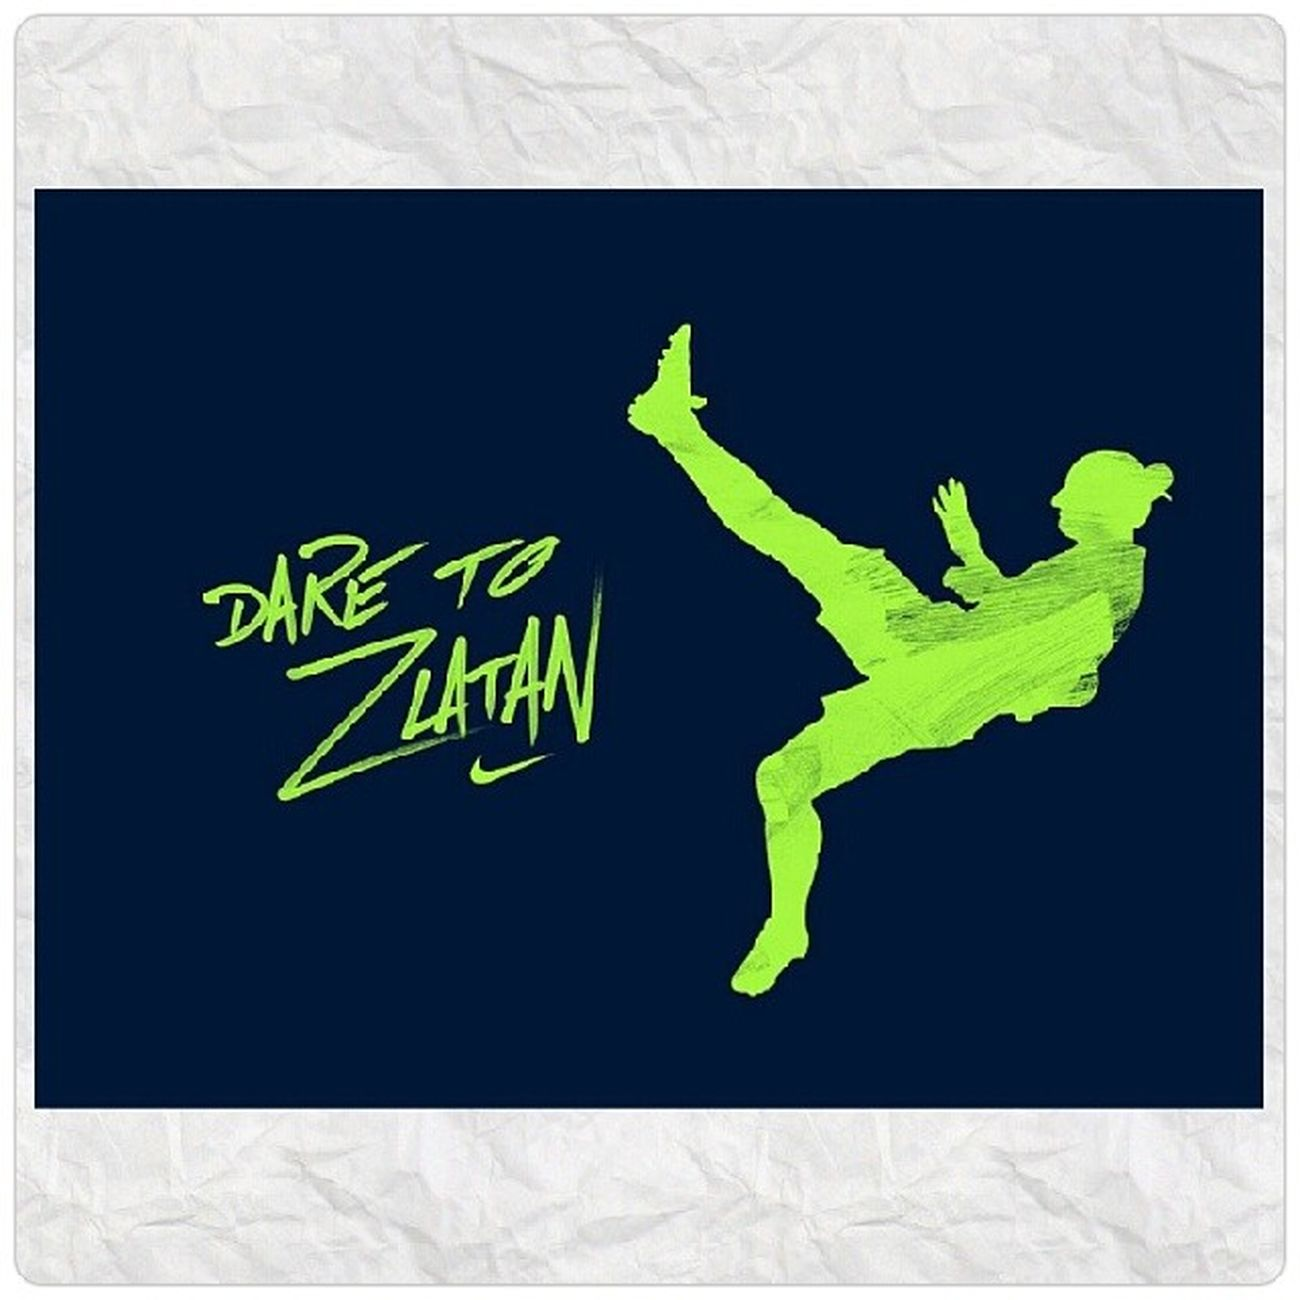 I am Dare to Zlatan. Congratulation to Zlatan Ibrahimovic on winning the Fifa Puskas Awards 2013. DareToZlatan Fifa Ballondor2013 .